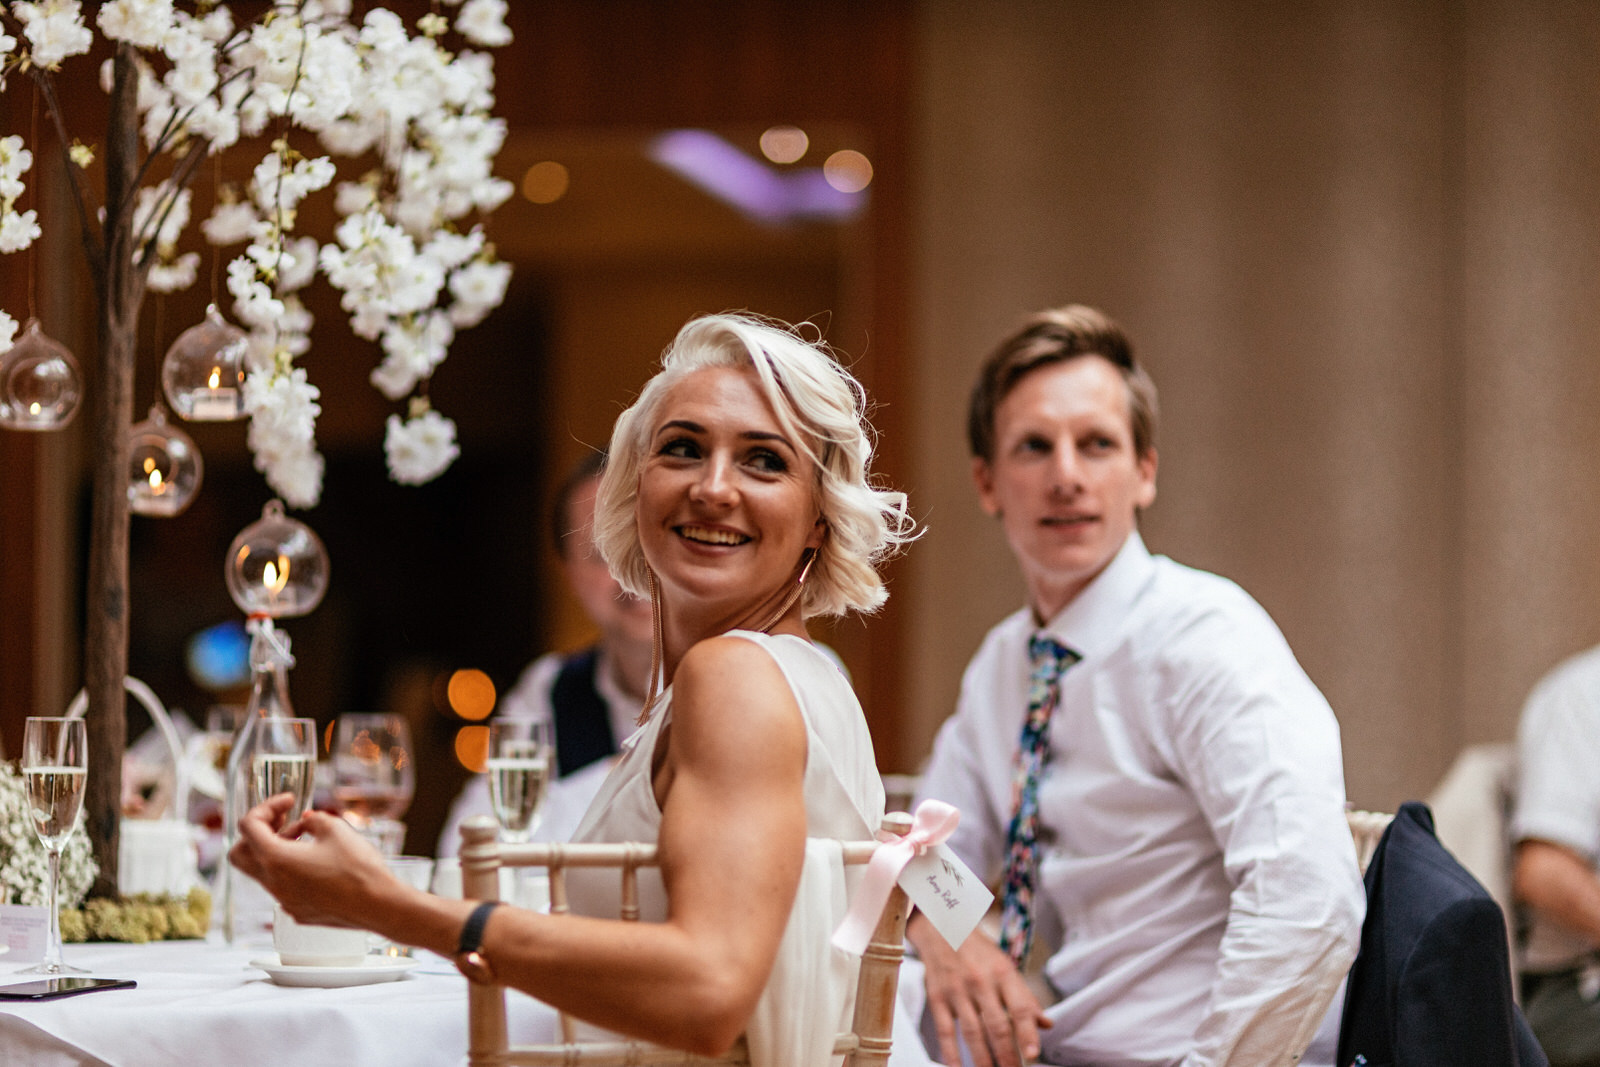 Moddershall-Oaks-Spa-Wedding-Photographer-047.jpg